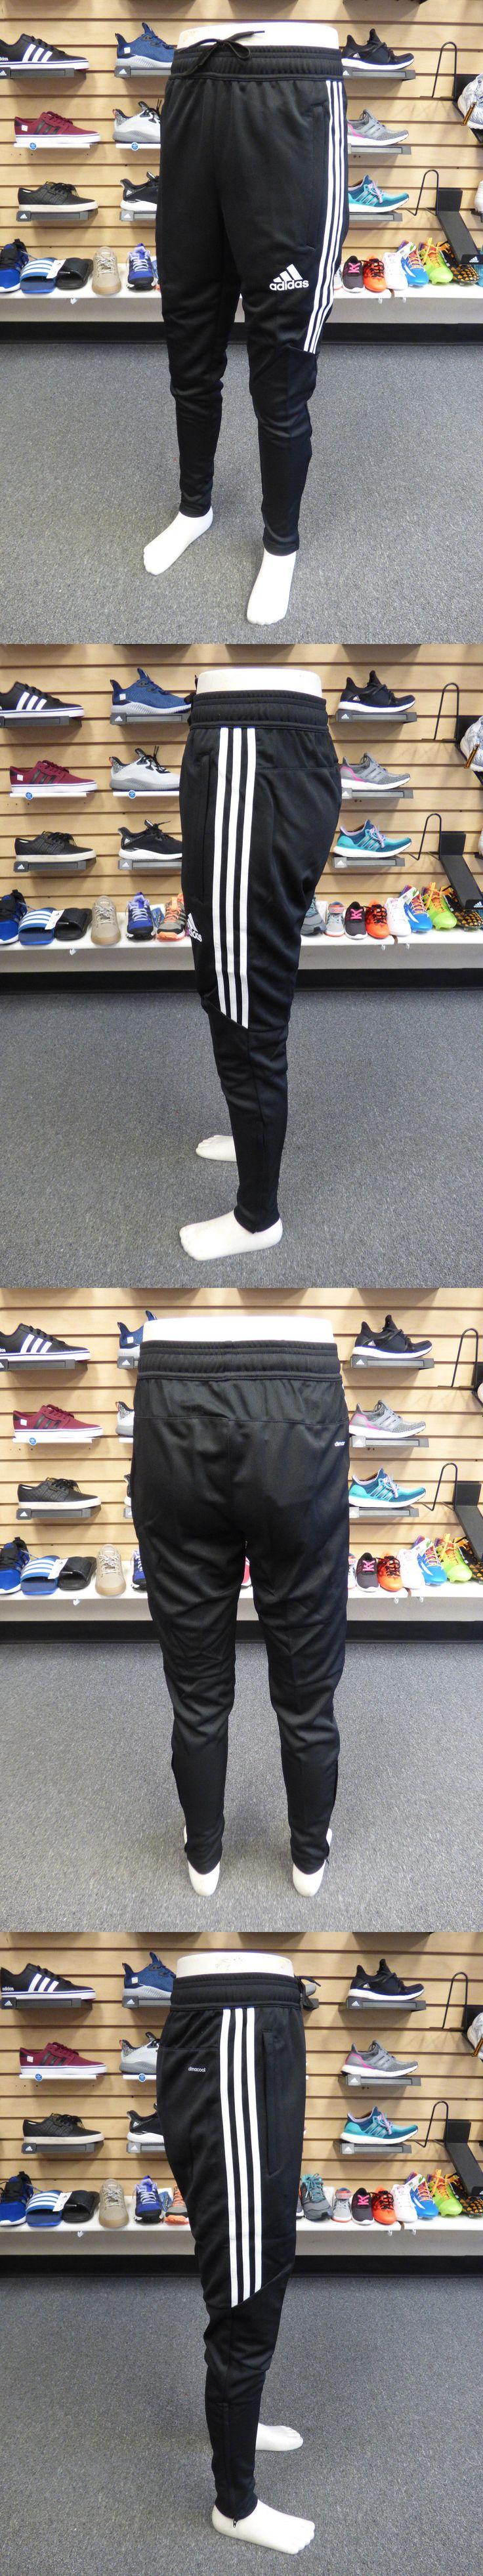 Men 123490: New Authentic Adidas Tiro 17 Men S Training Pants - Black White: Bs3693 -> BUY IT NOW ONLY: $40.45 on eBay!